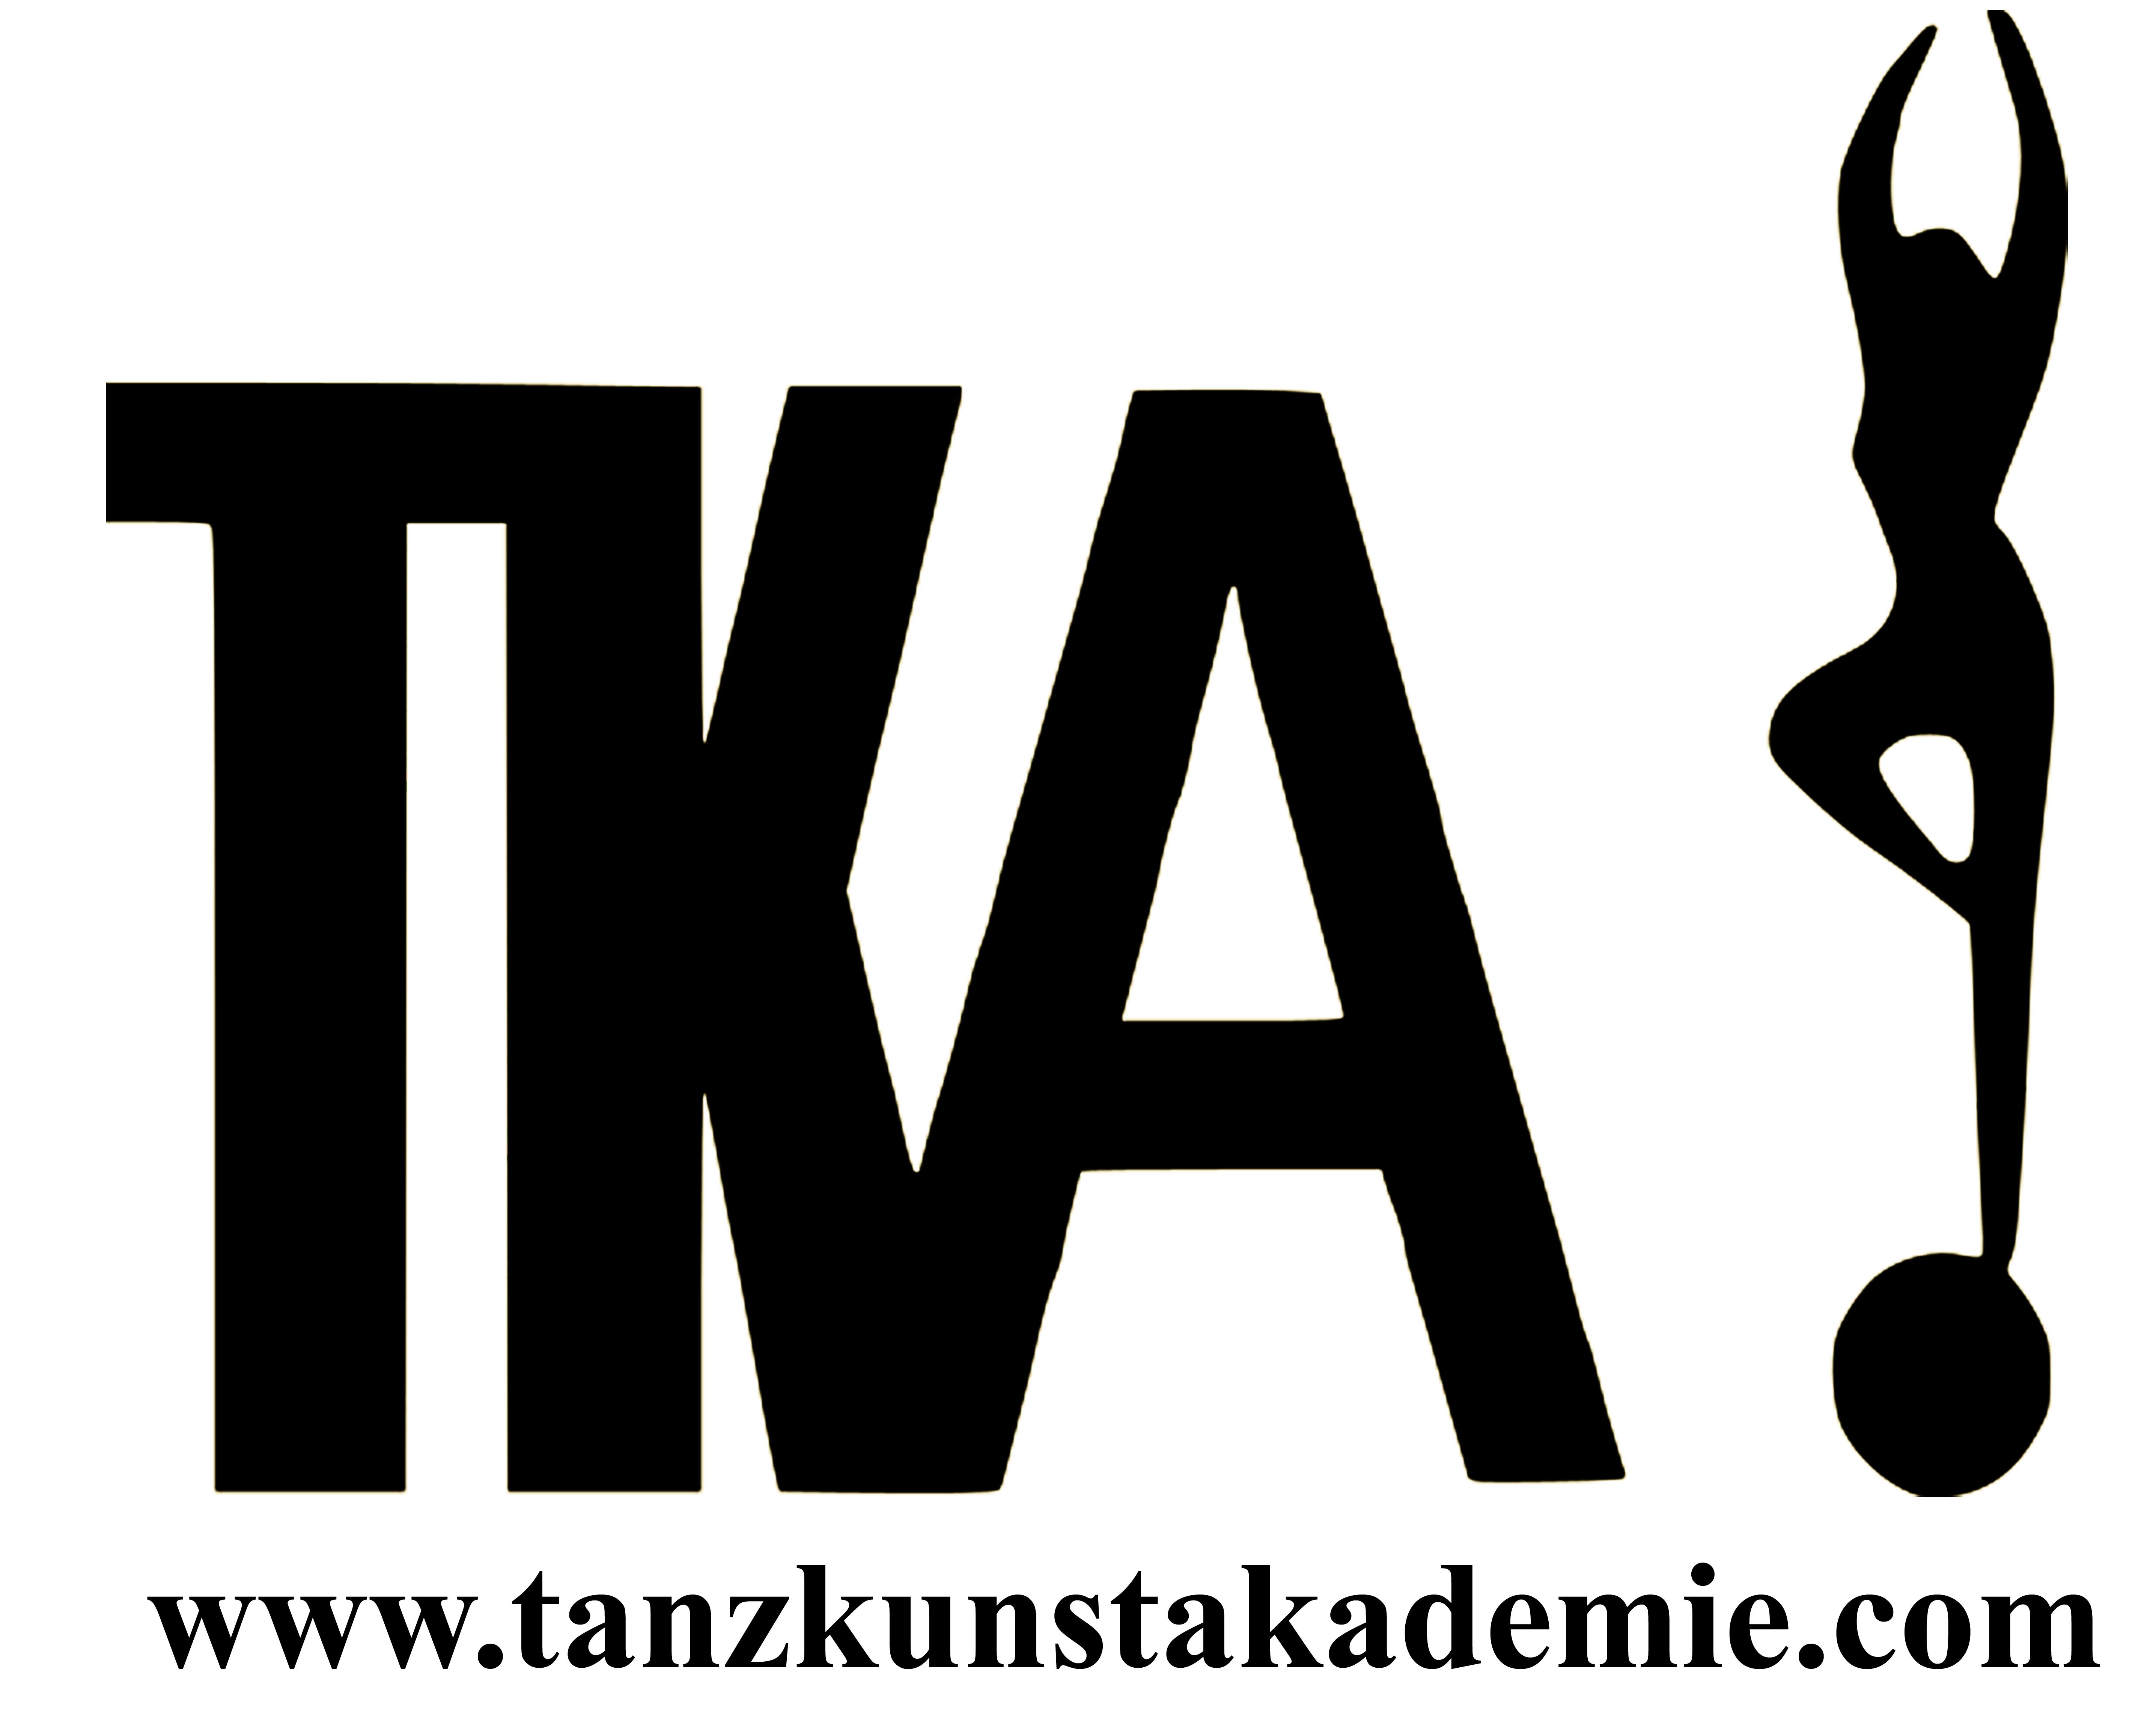 TKA TanzKunstAkademie